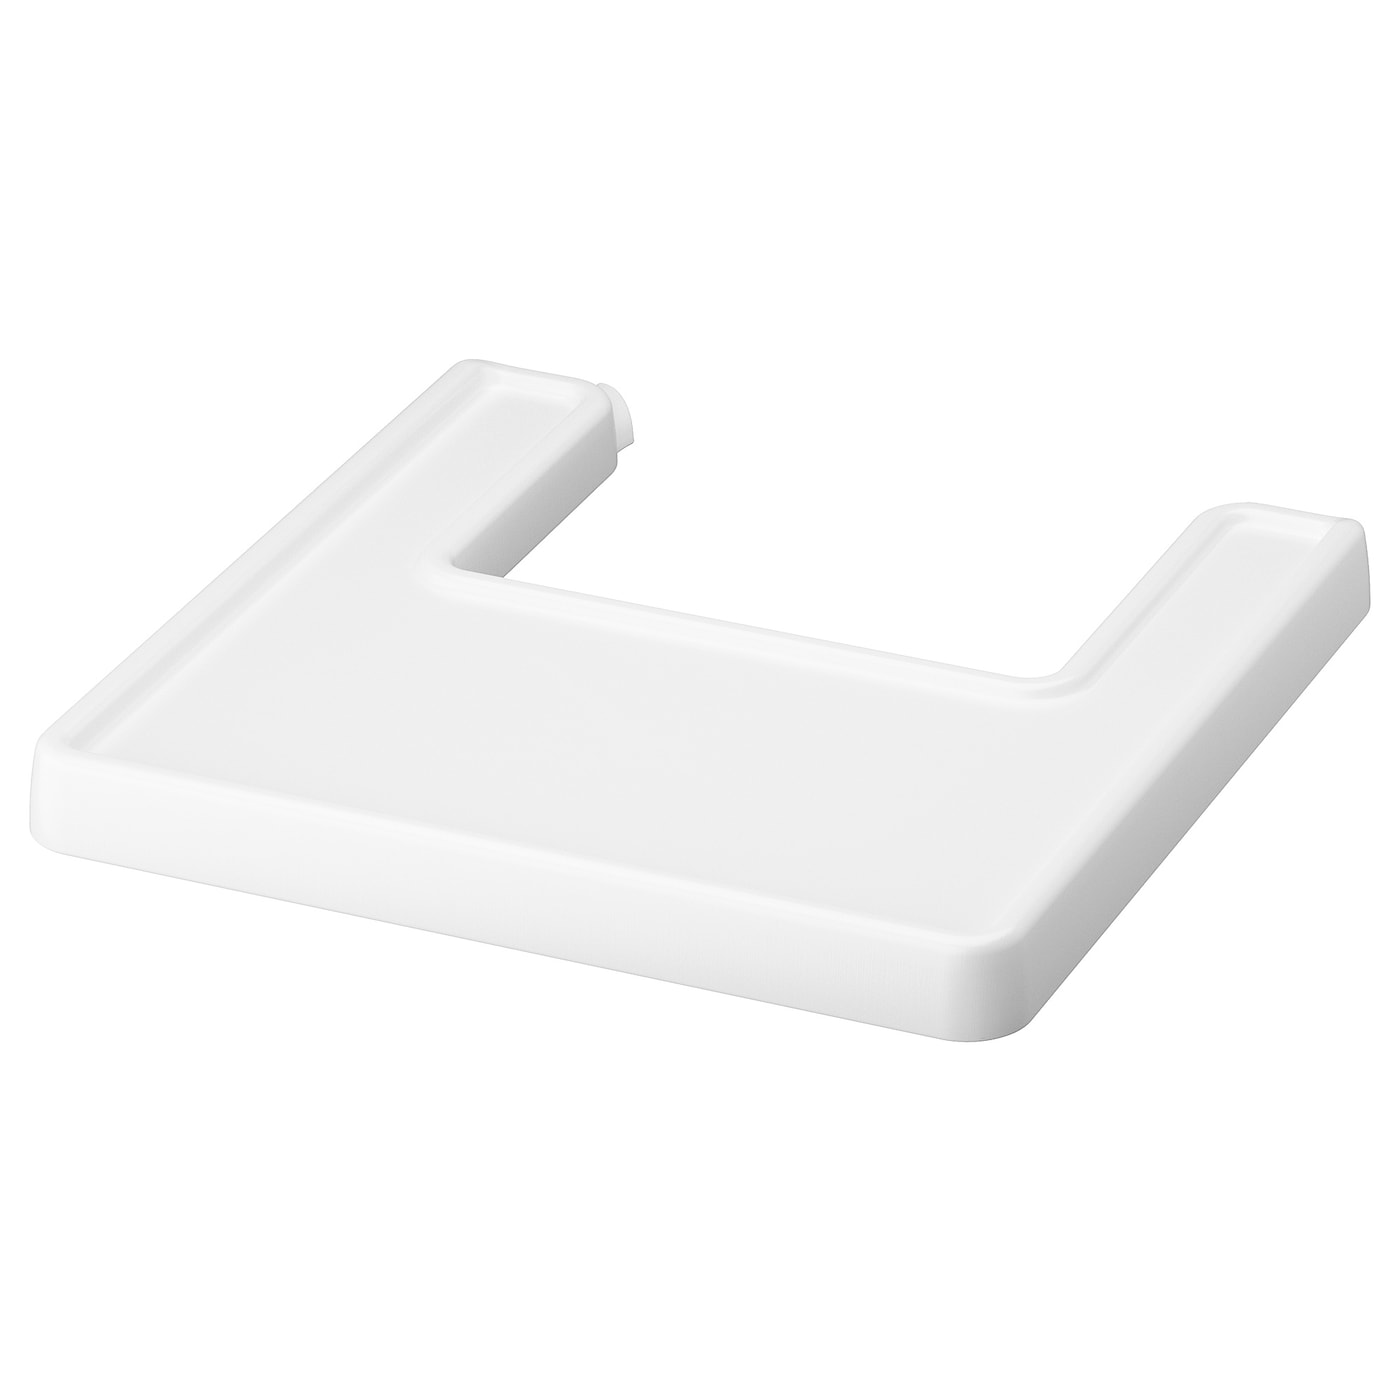 IKEA Hochstuhl Antilop mit Tablett Wei/ß